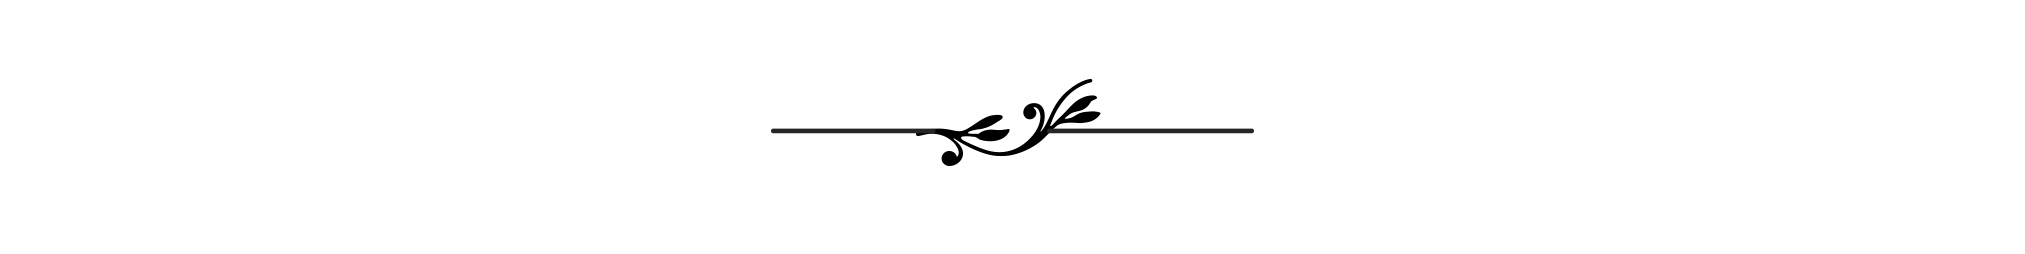 pw_divider_2-LRG.png